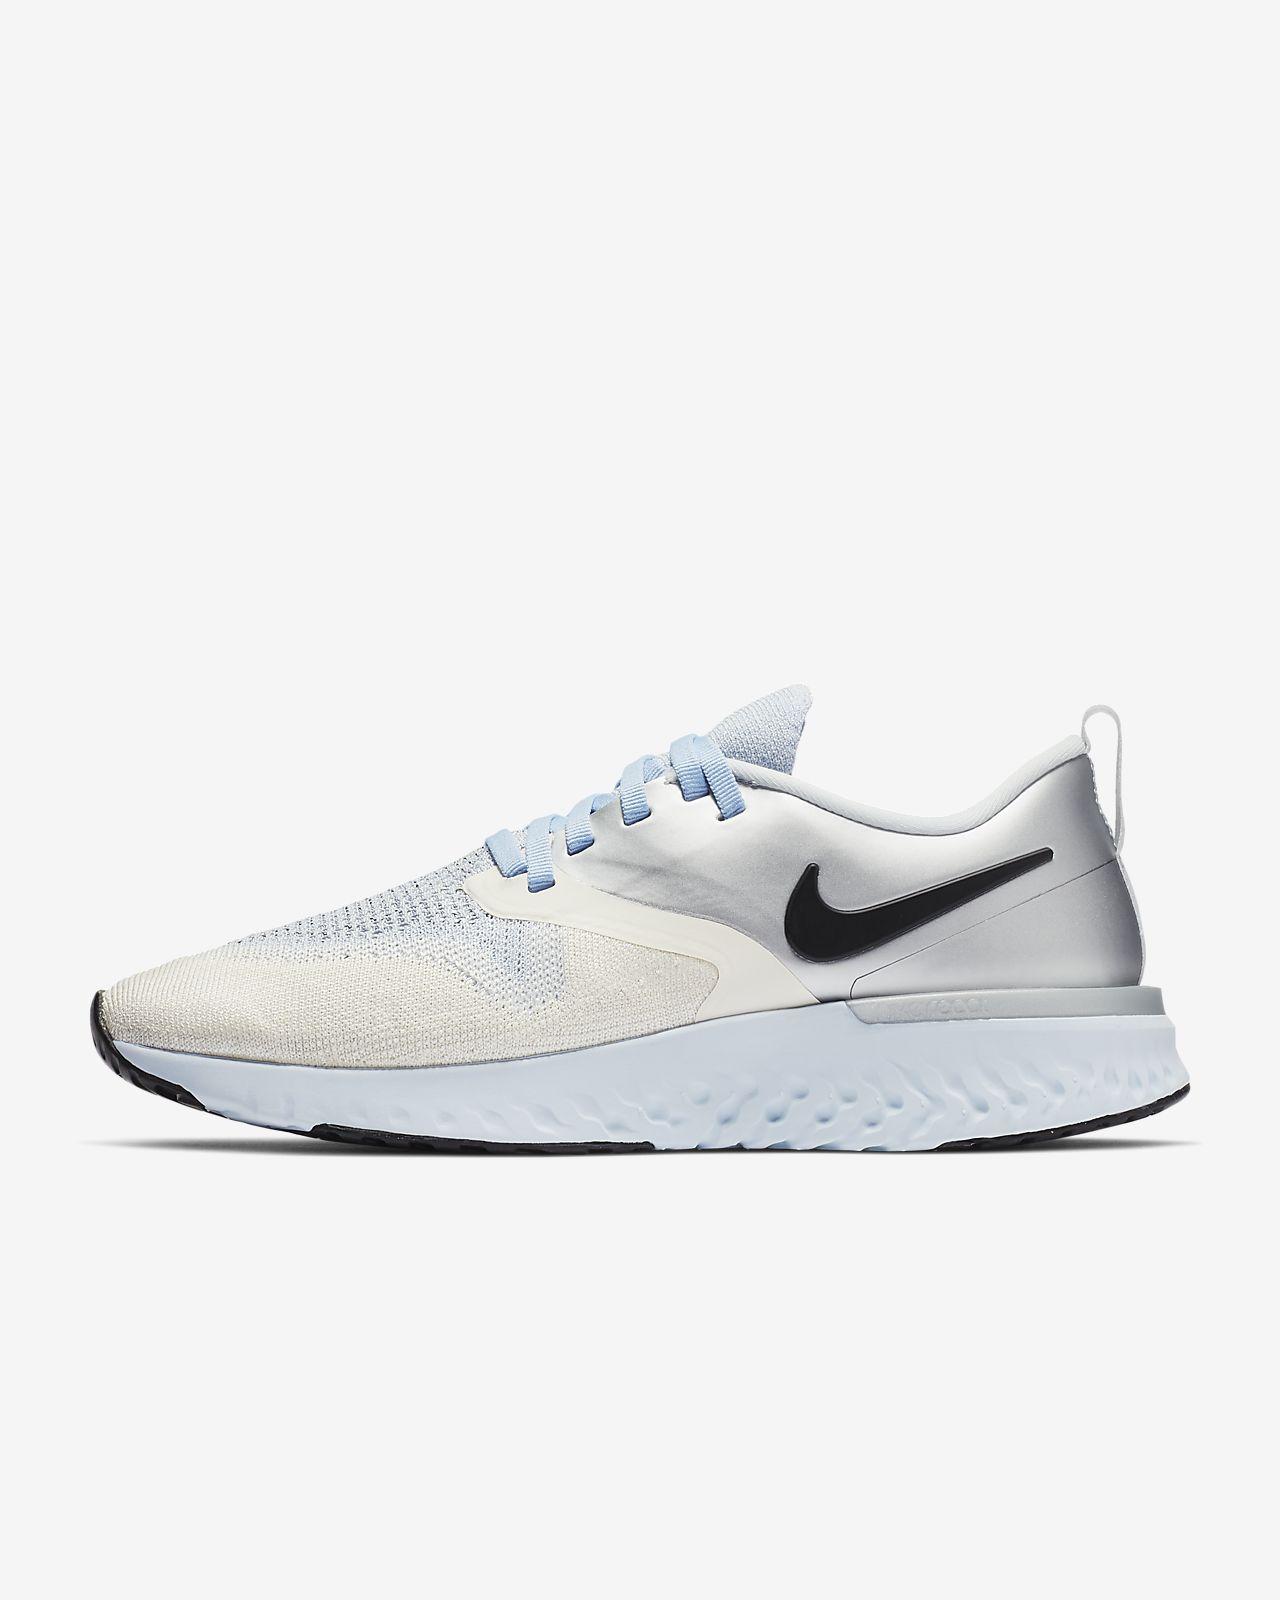 07b0c55f747bb Nike Odyssey React Flyknit 2 Premium Women s Running Shoe. Nike.com AT